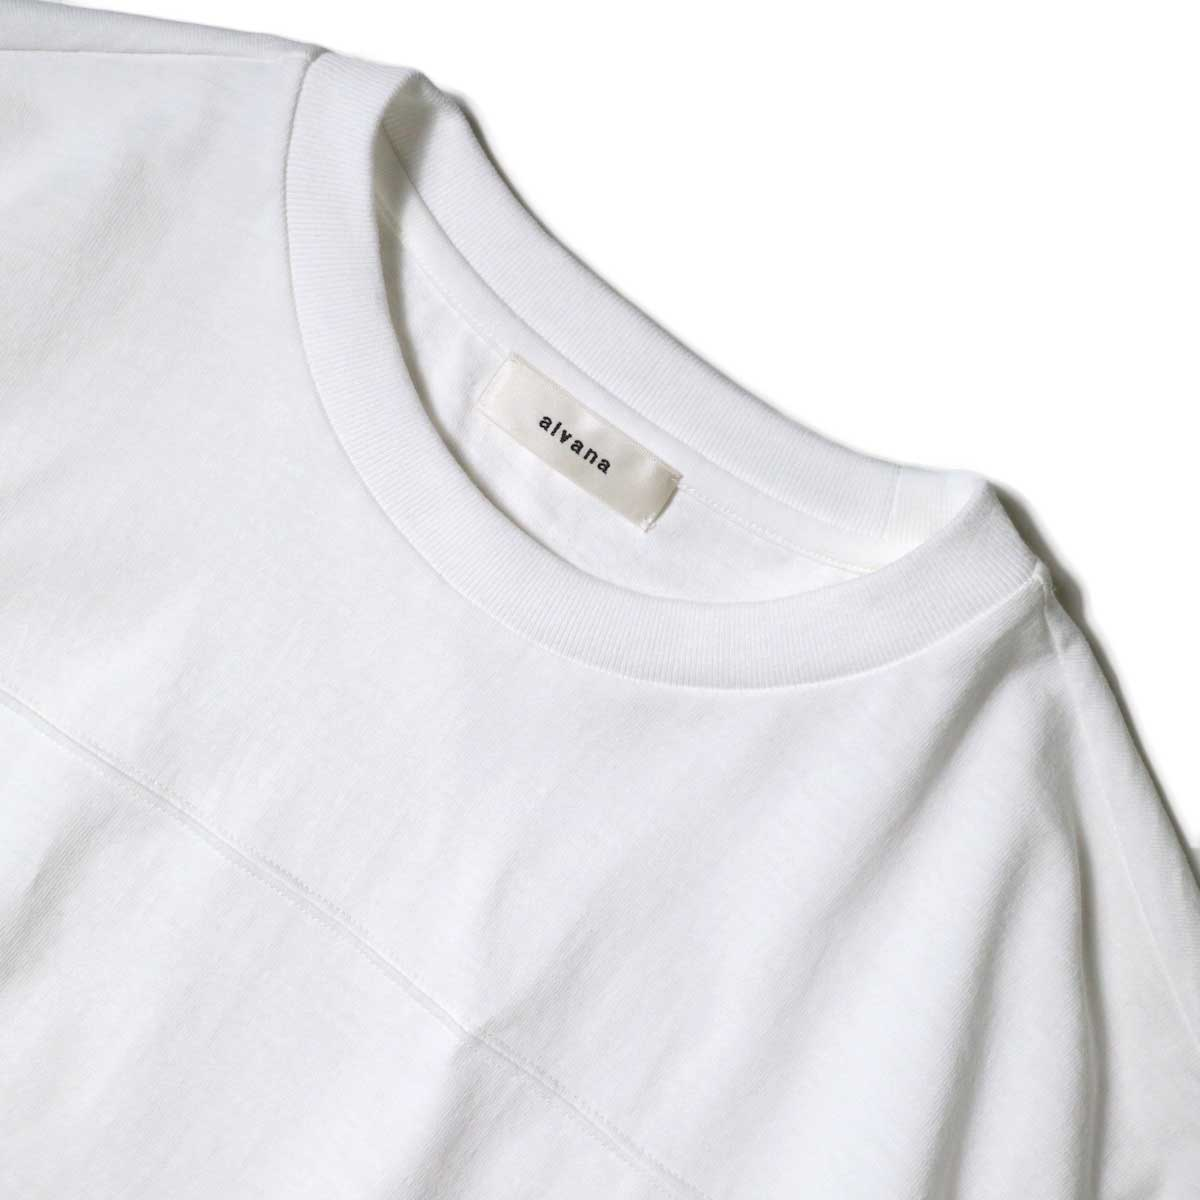 alvana / Protect Football S/S Tee (White)ネック